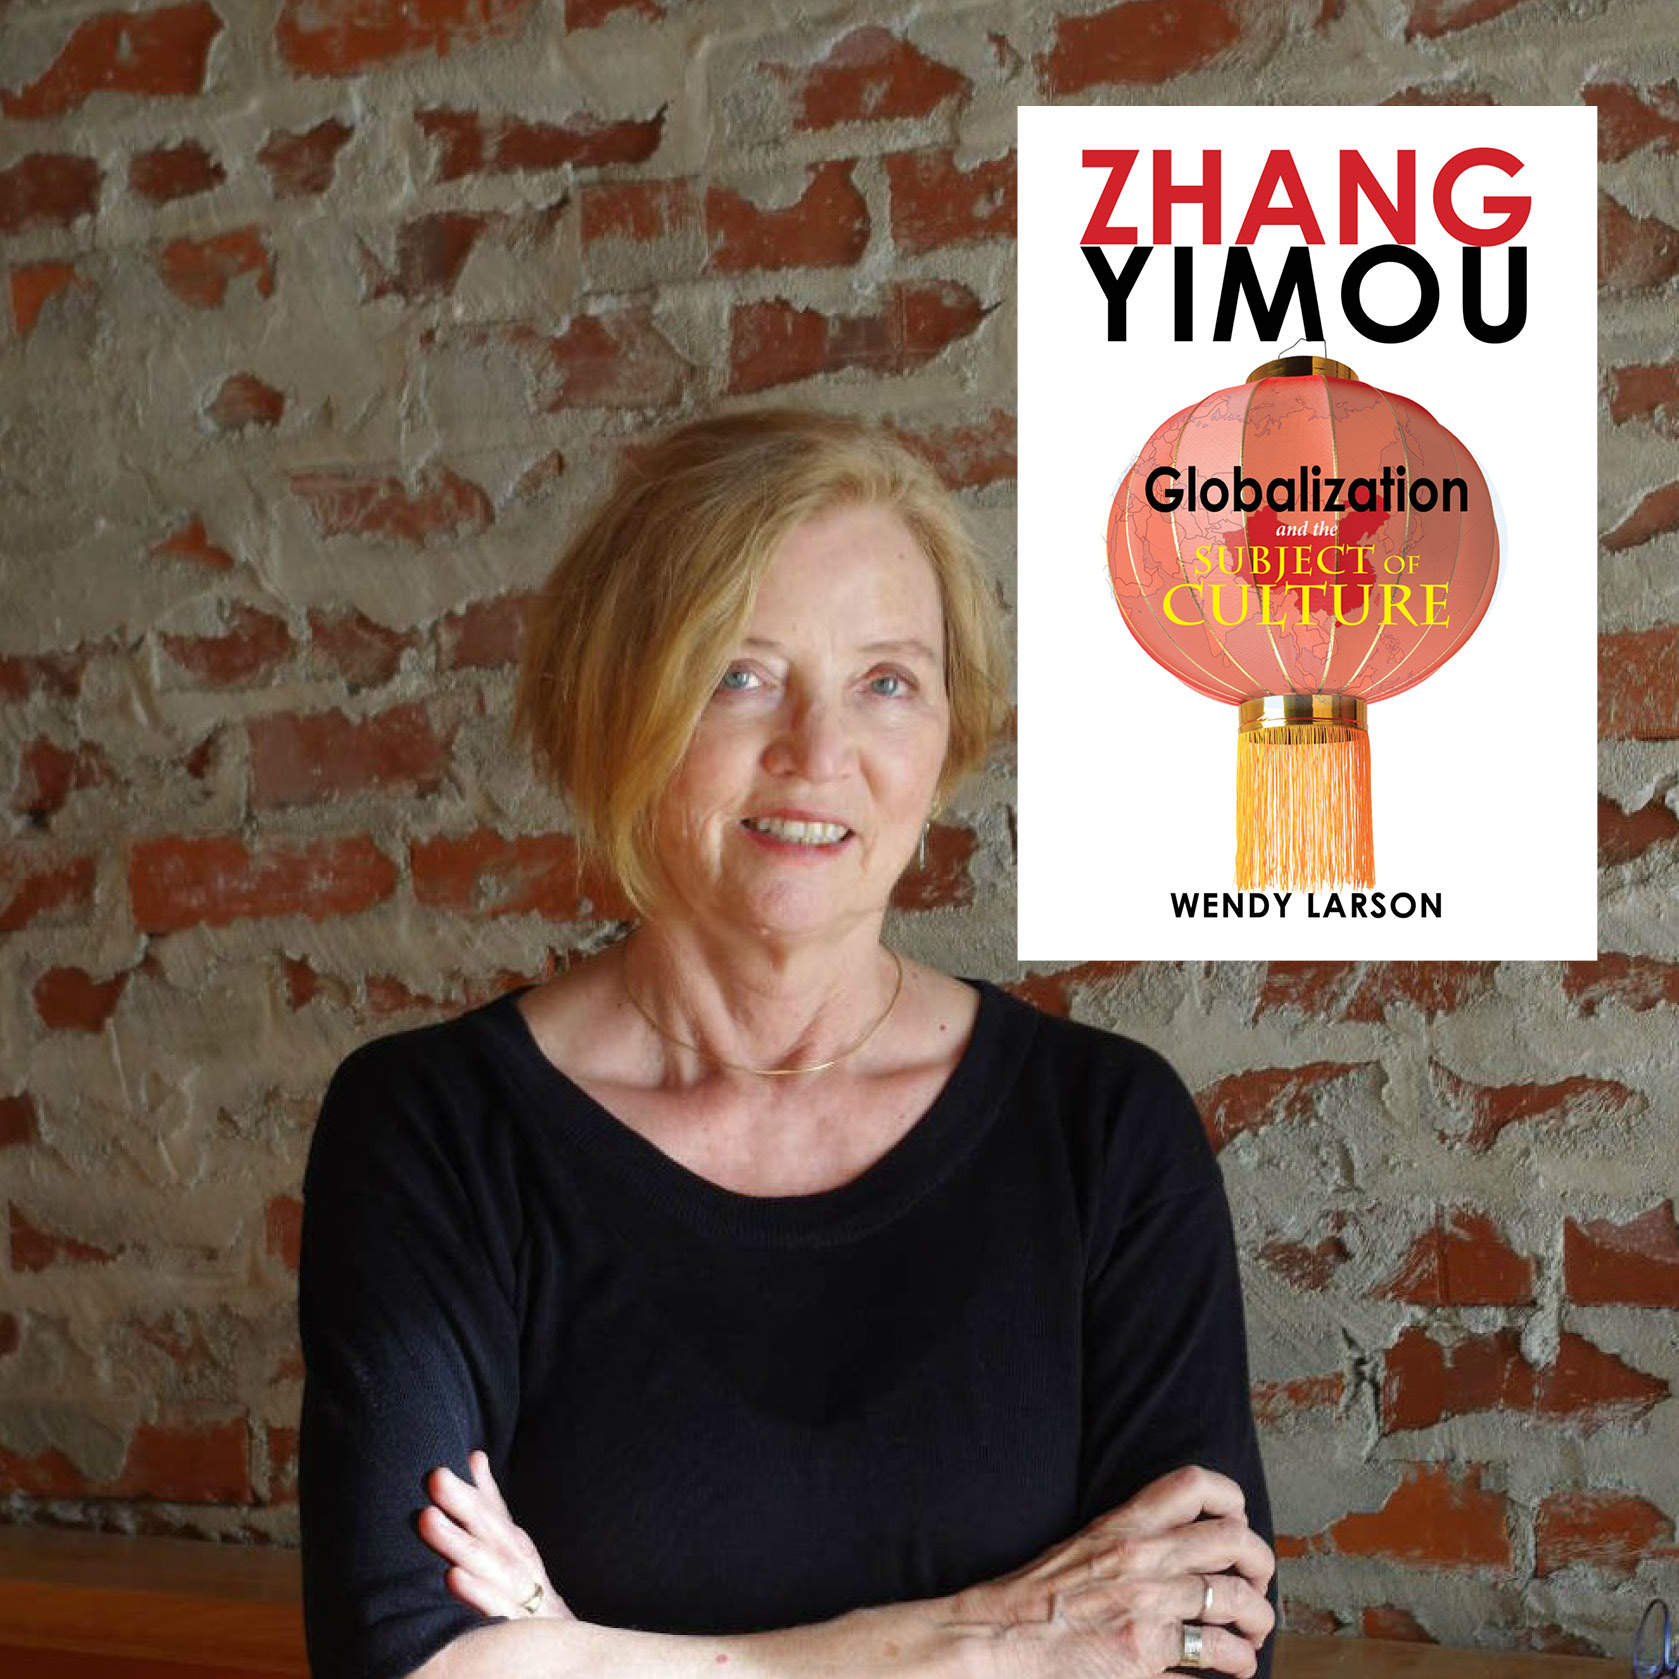 Cambria Press author Wendy Larson publication Zhang Yimou